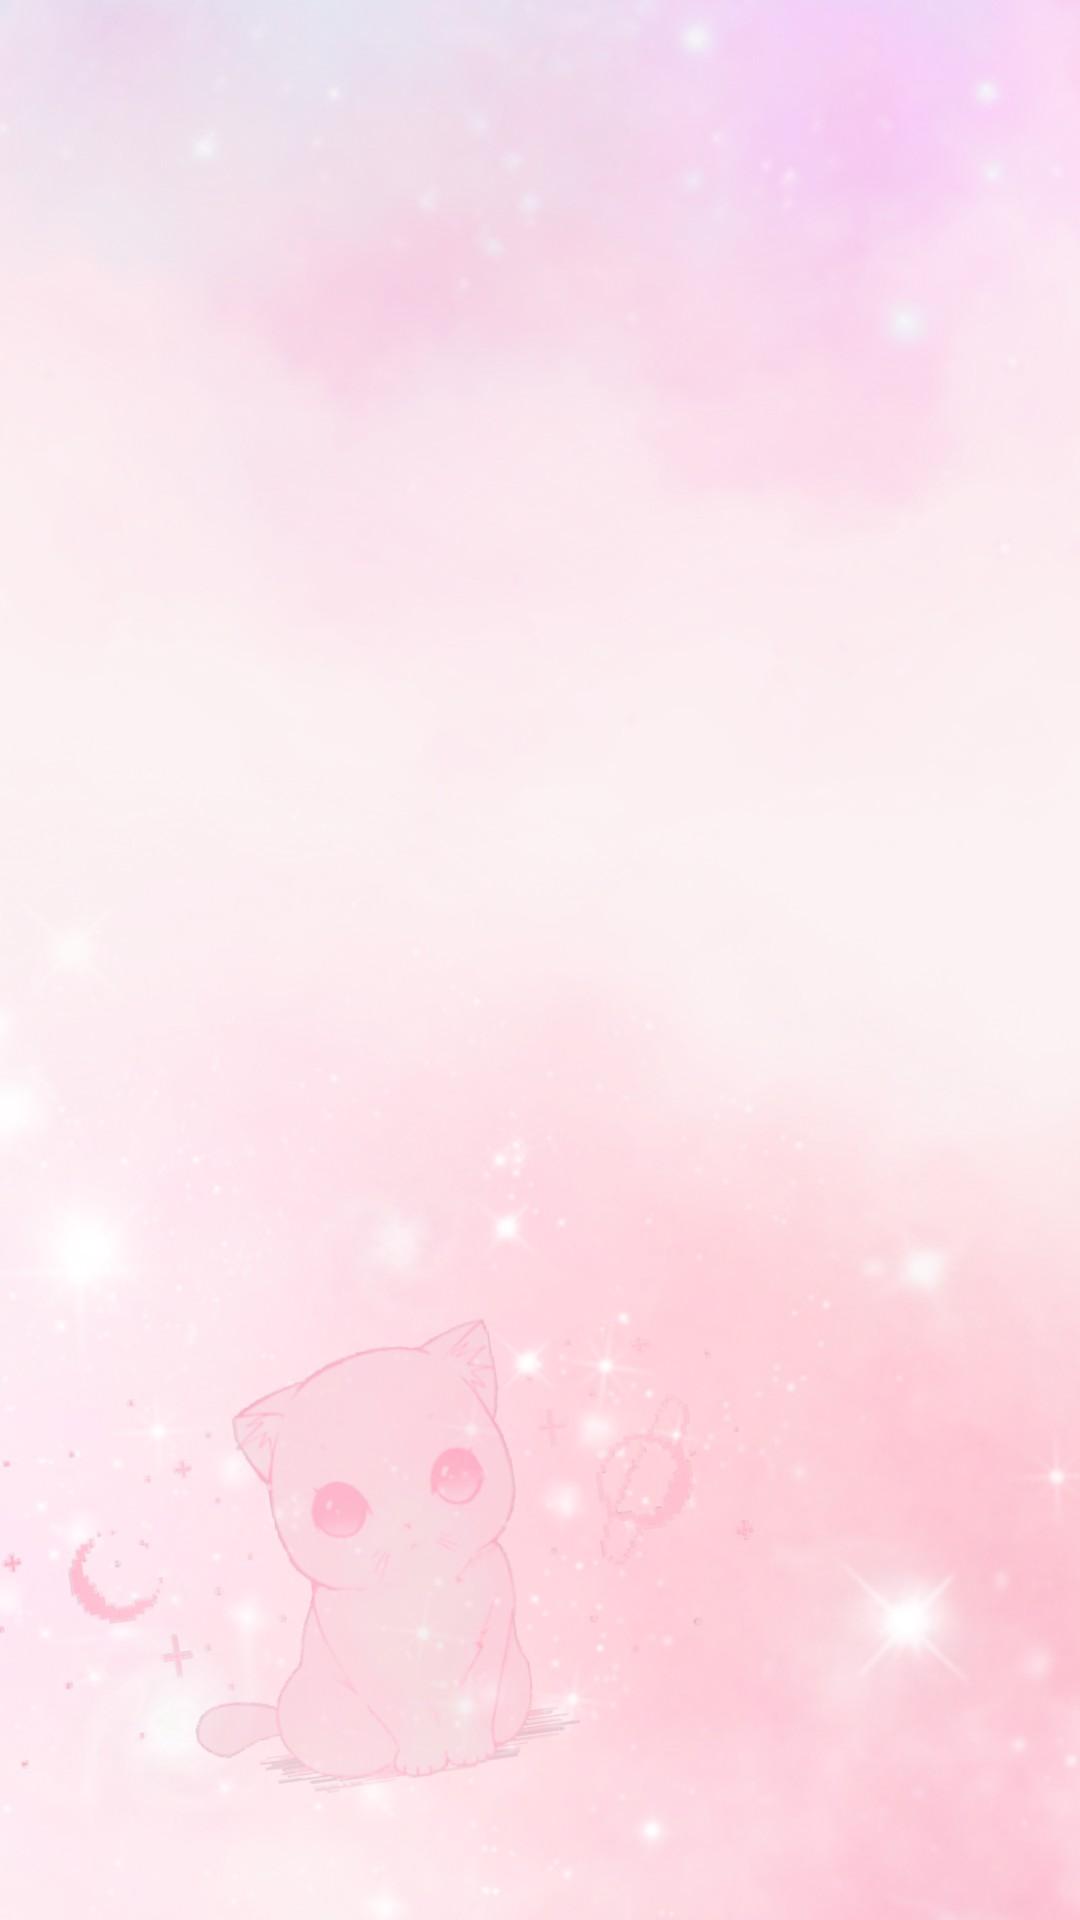 Cartoon Pink Cat Wallpaper Hd